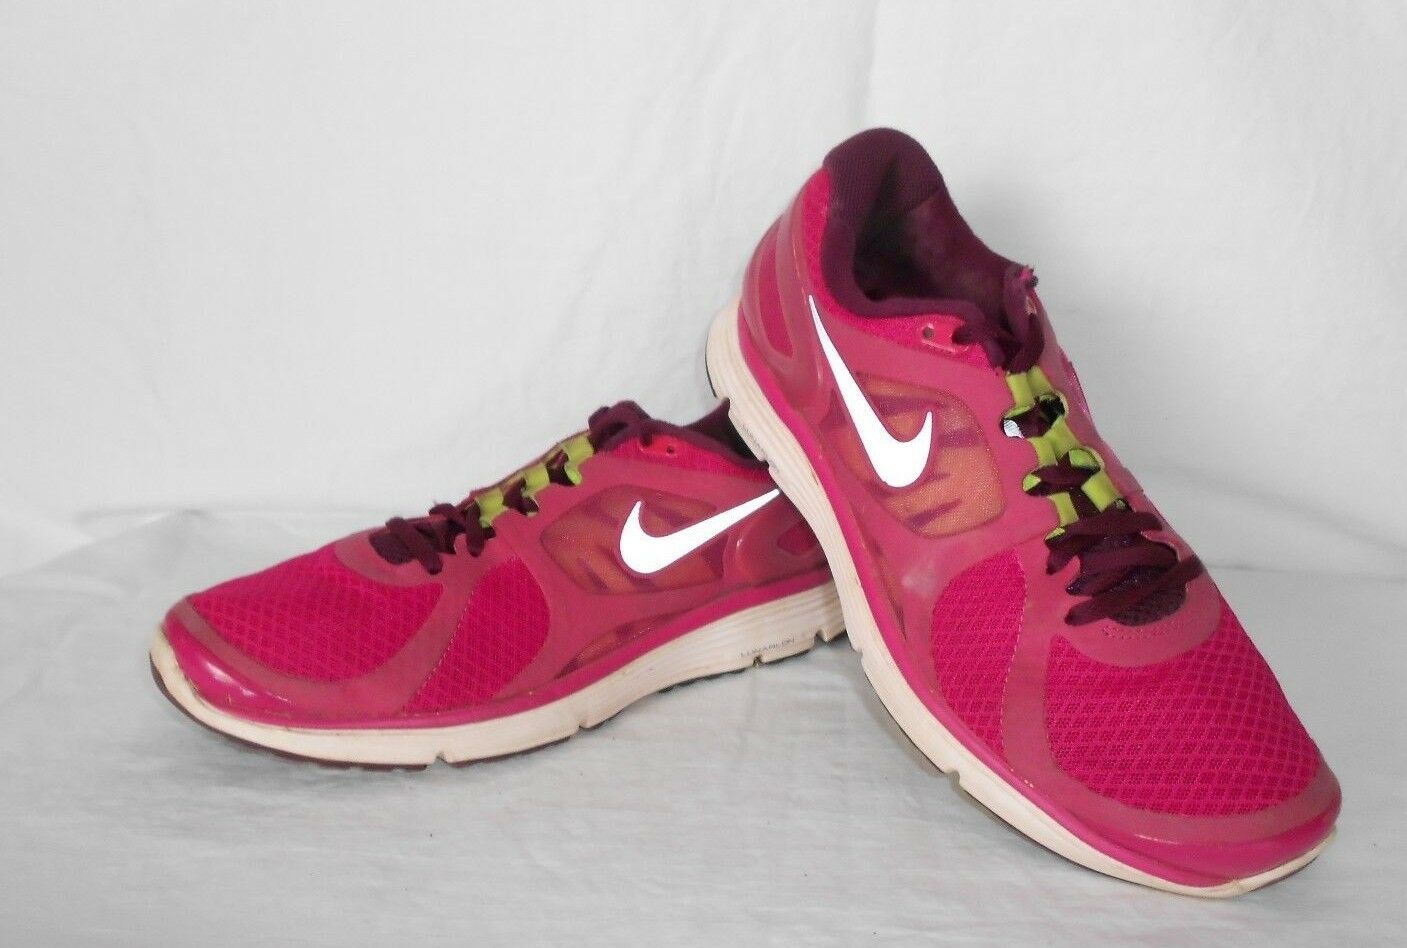 Women's Nike Lunareclipe 2 Pink Athletic Sneakers Comfortable Seasonal clearance sale